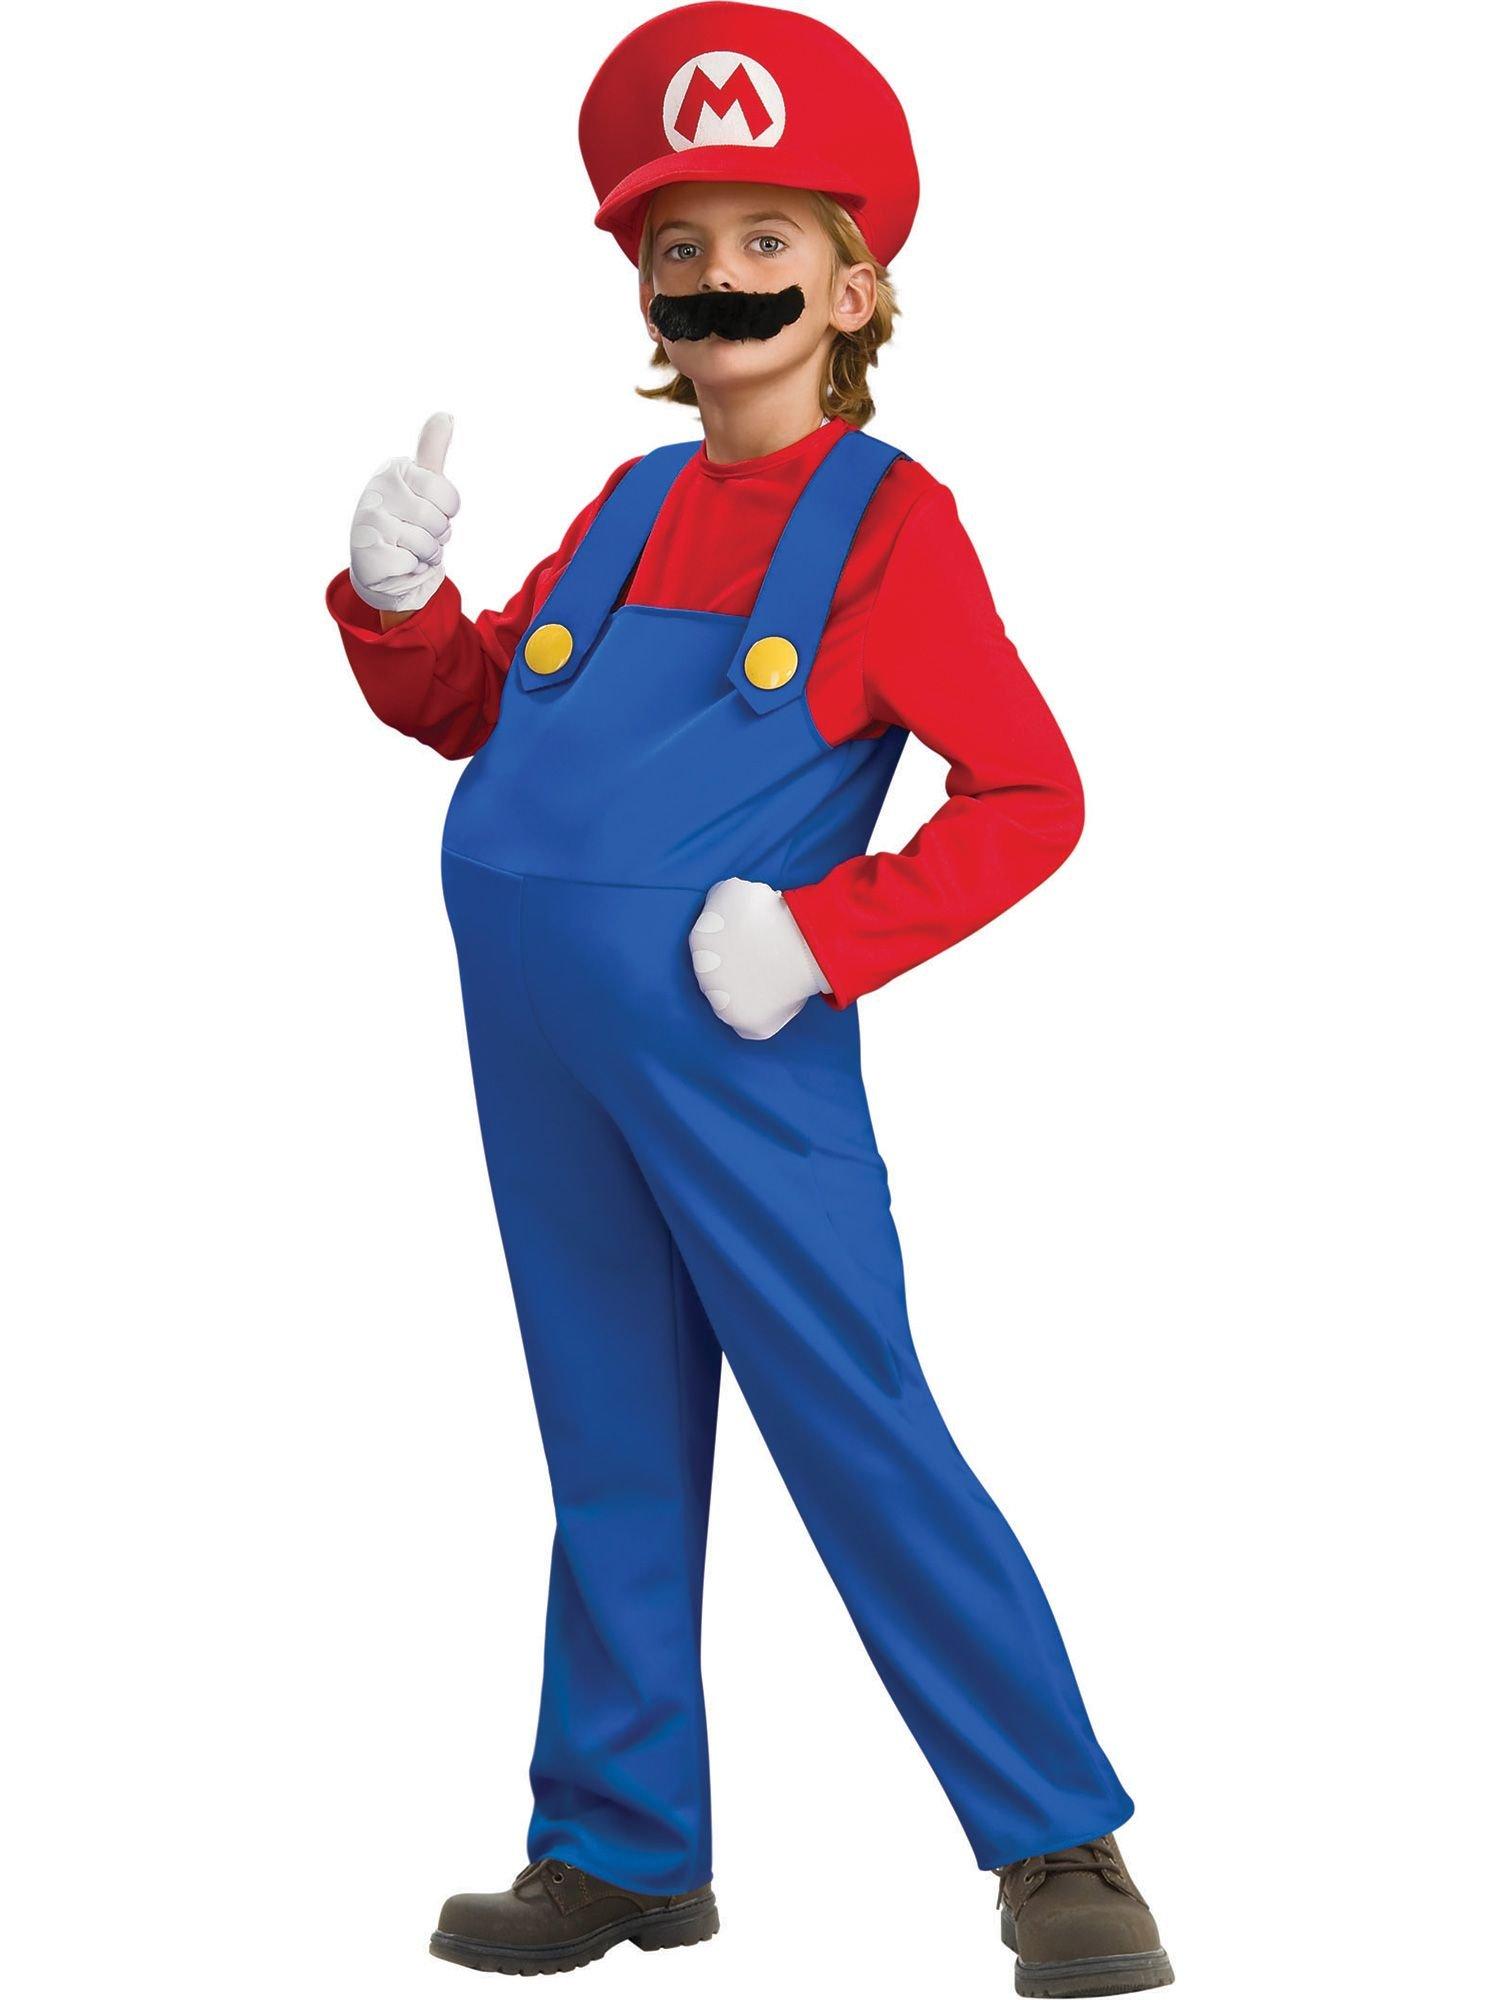 Boy's Nintendo's Super Mario Brothers Deluxe Costume, 7-8